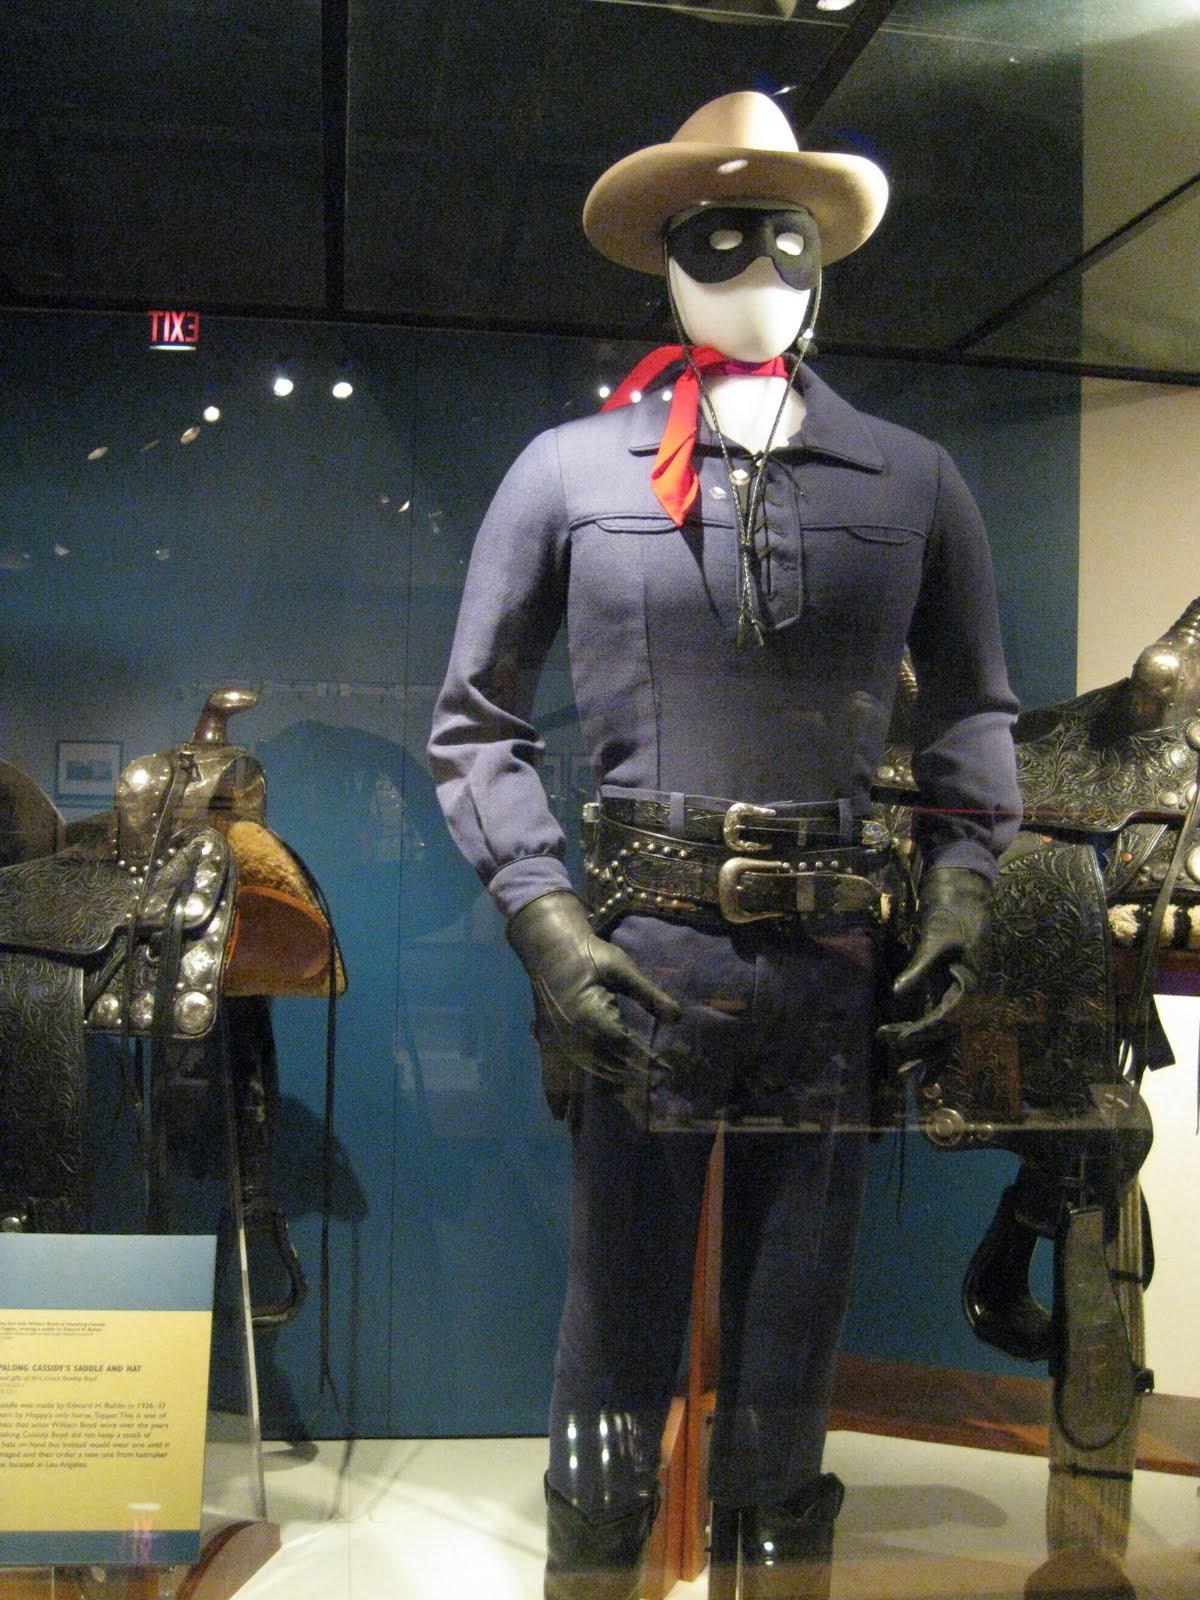 Emerald And Hobbit: The Original Lone Ranger Costume